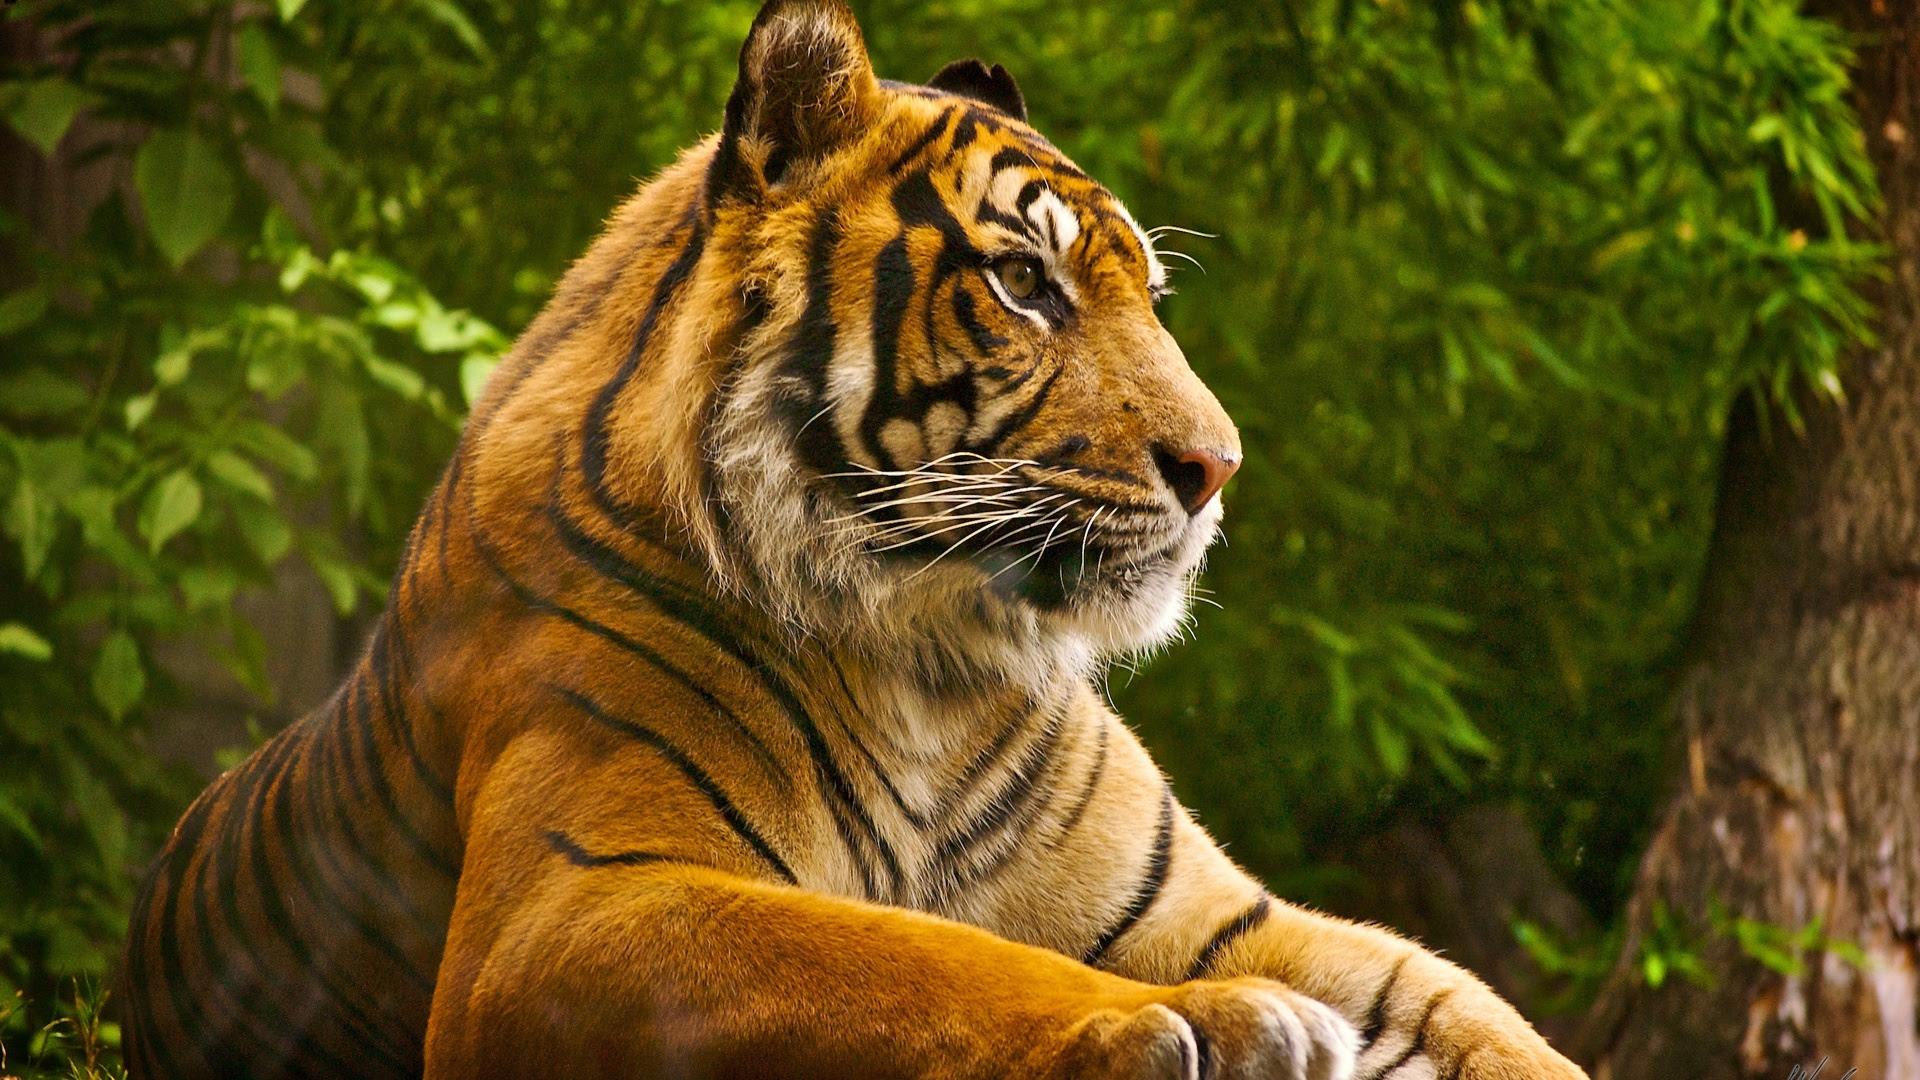 Sumatran Tiger Wallpapers In Jpg Format For Free Download